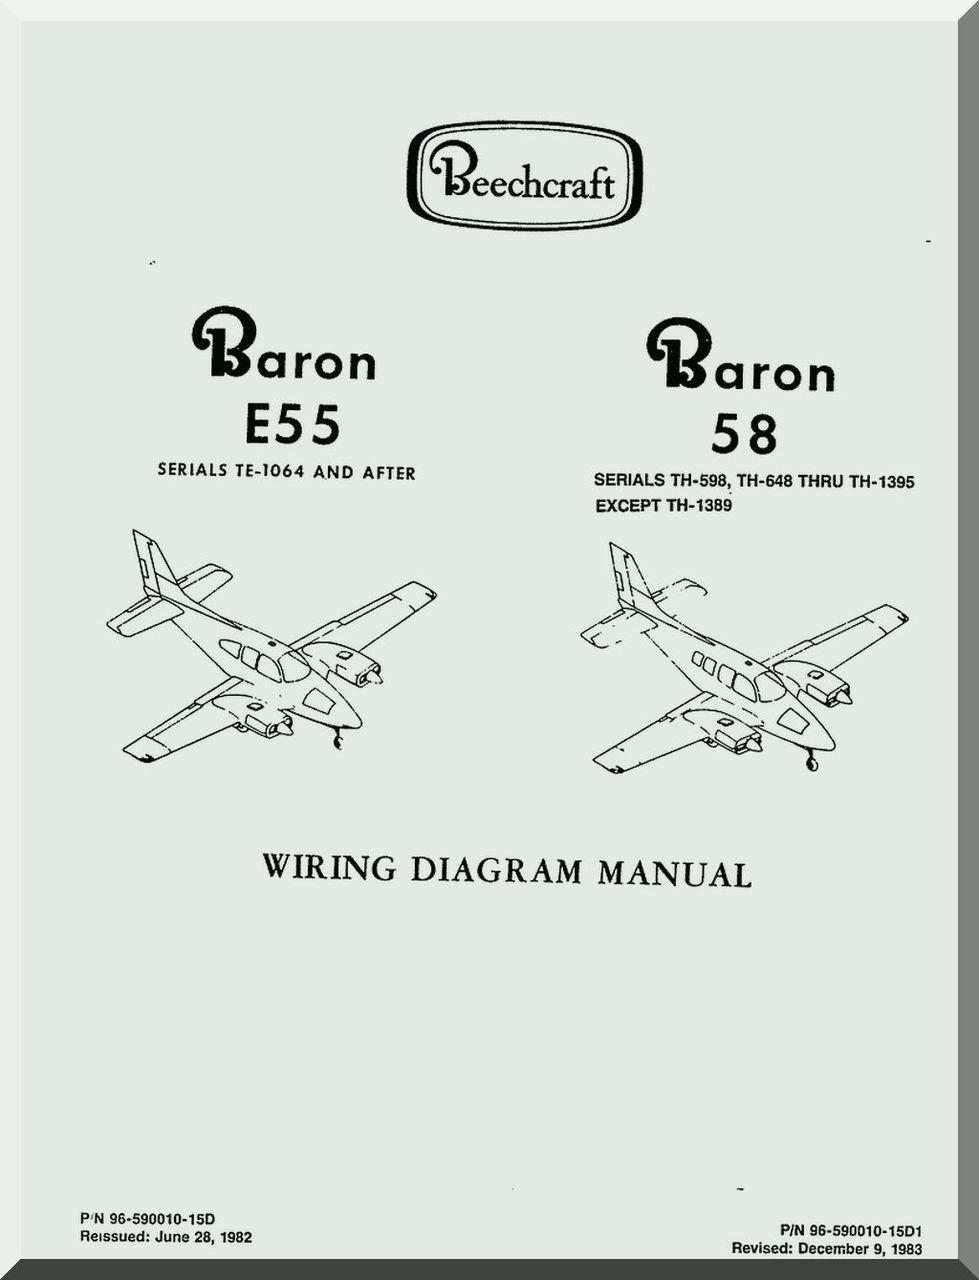 Wiring Diagram Symbols Aircraft